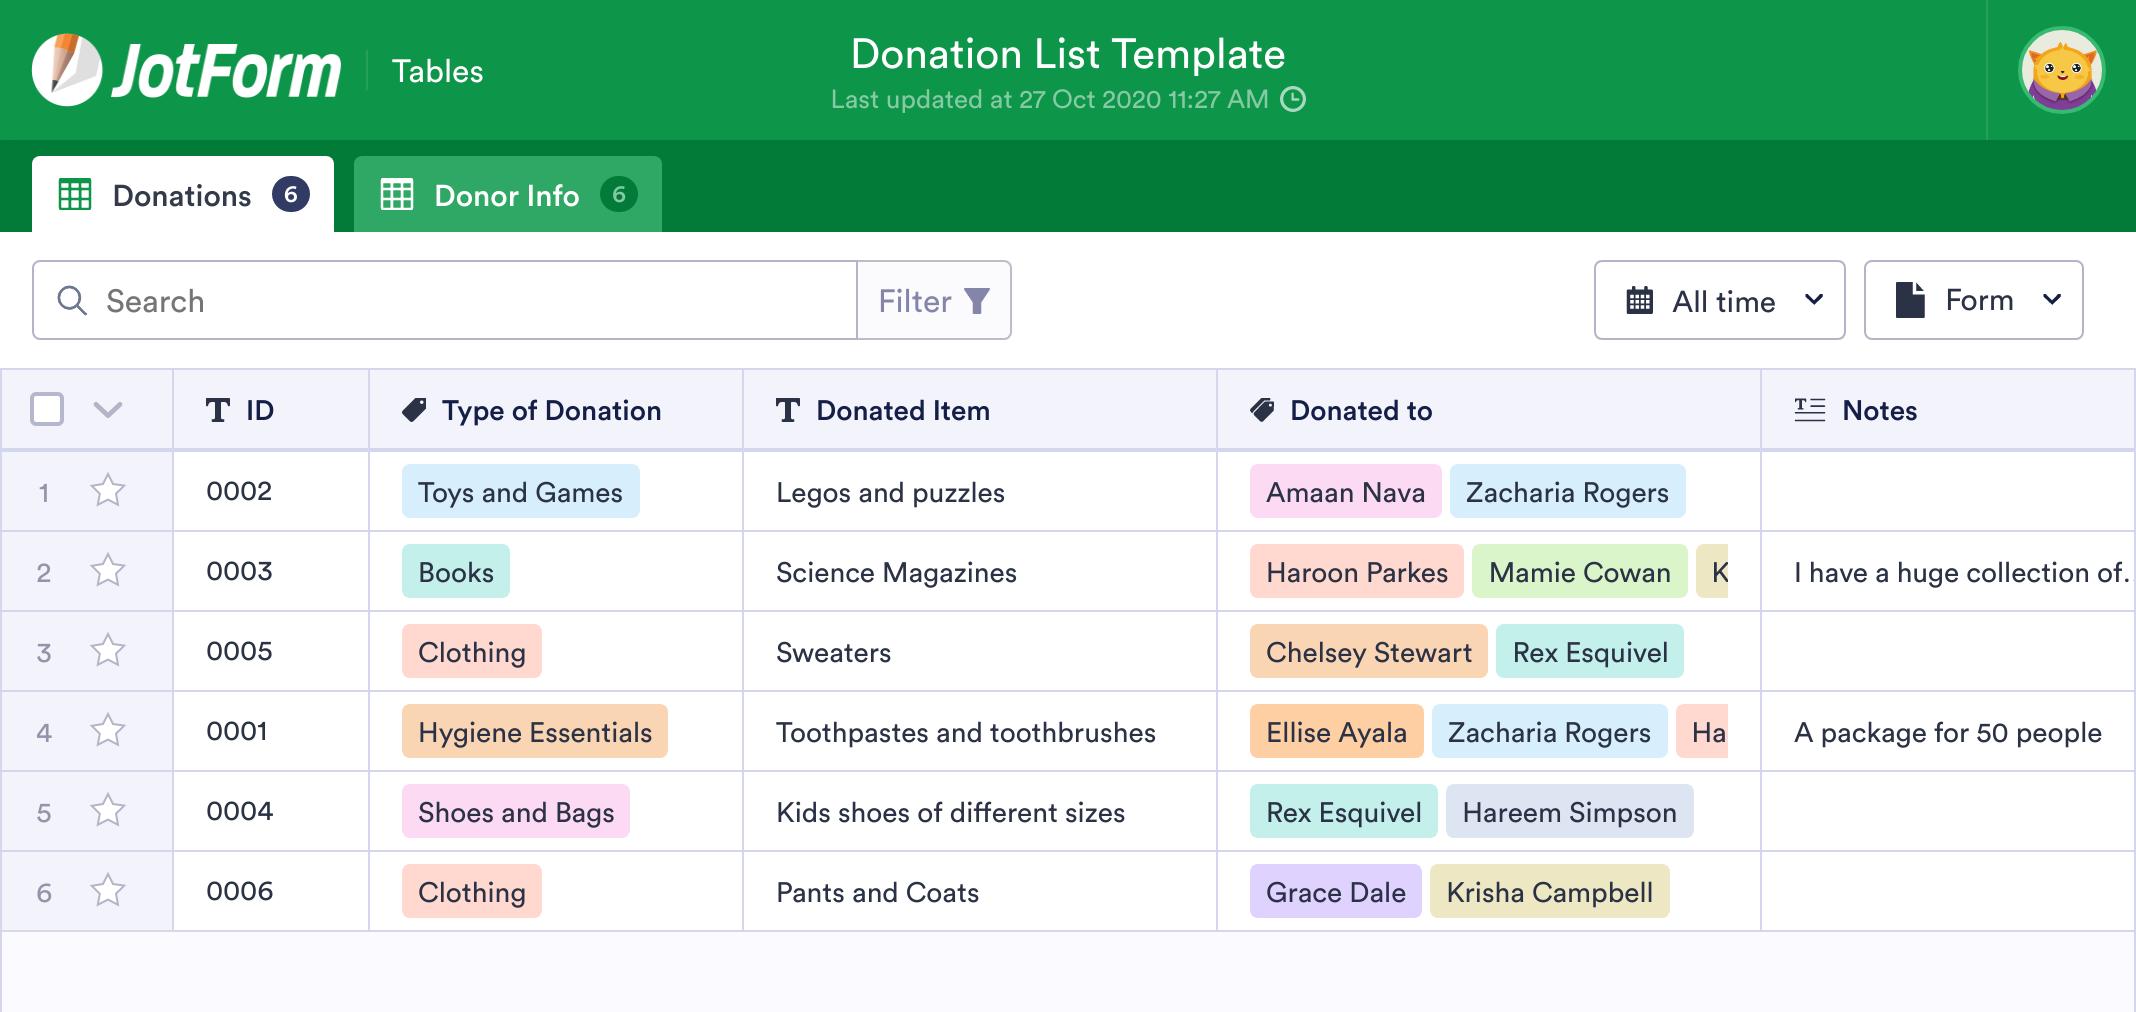 Donation List Template